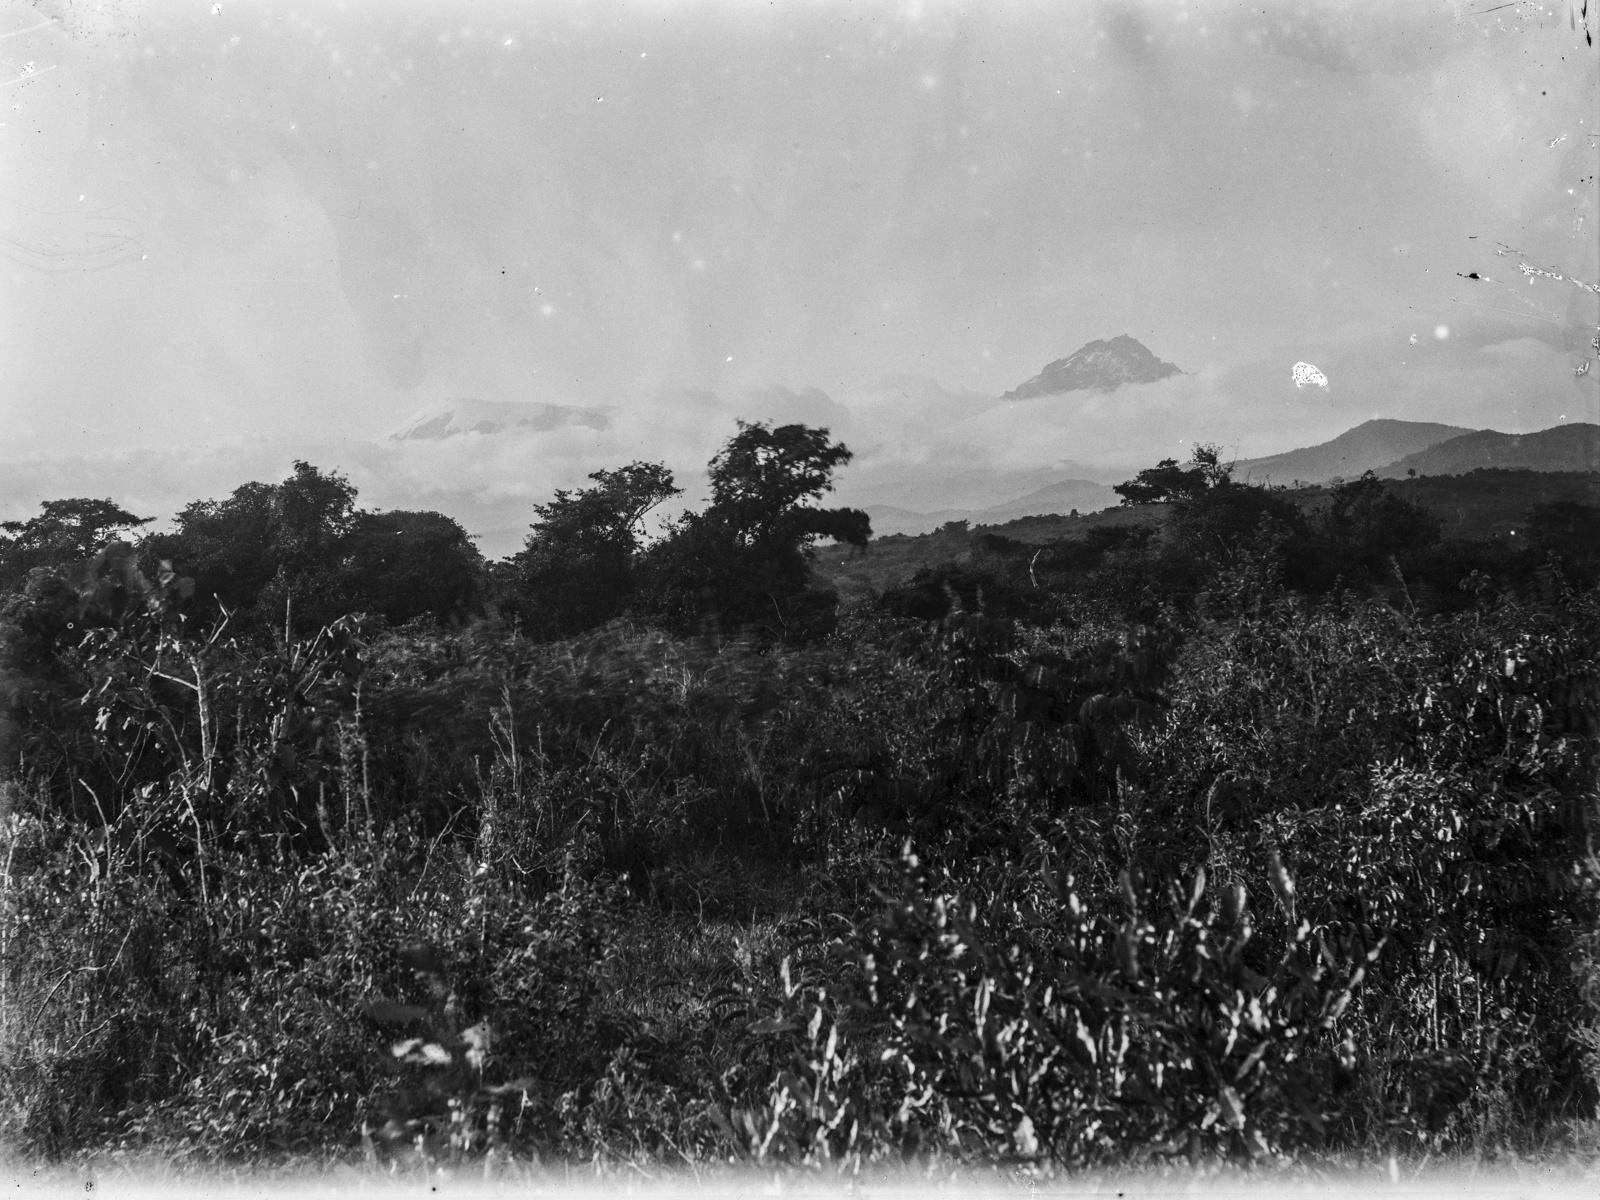 94. Вид на пейзаж у подножия горы Килиманджаро